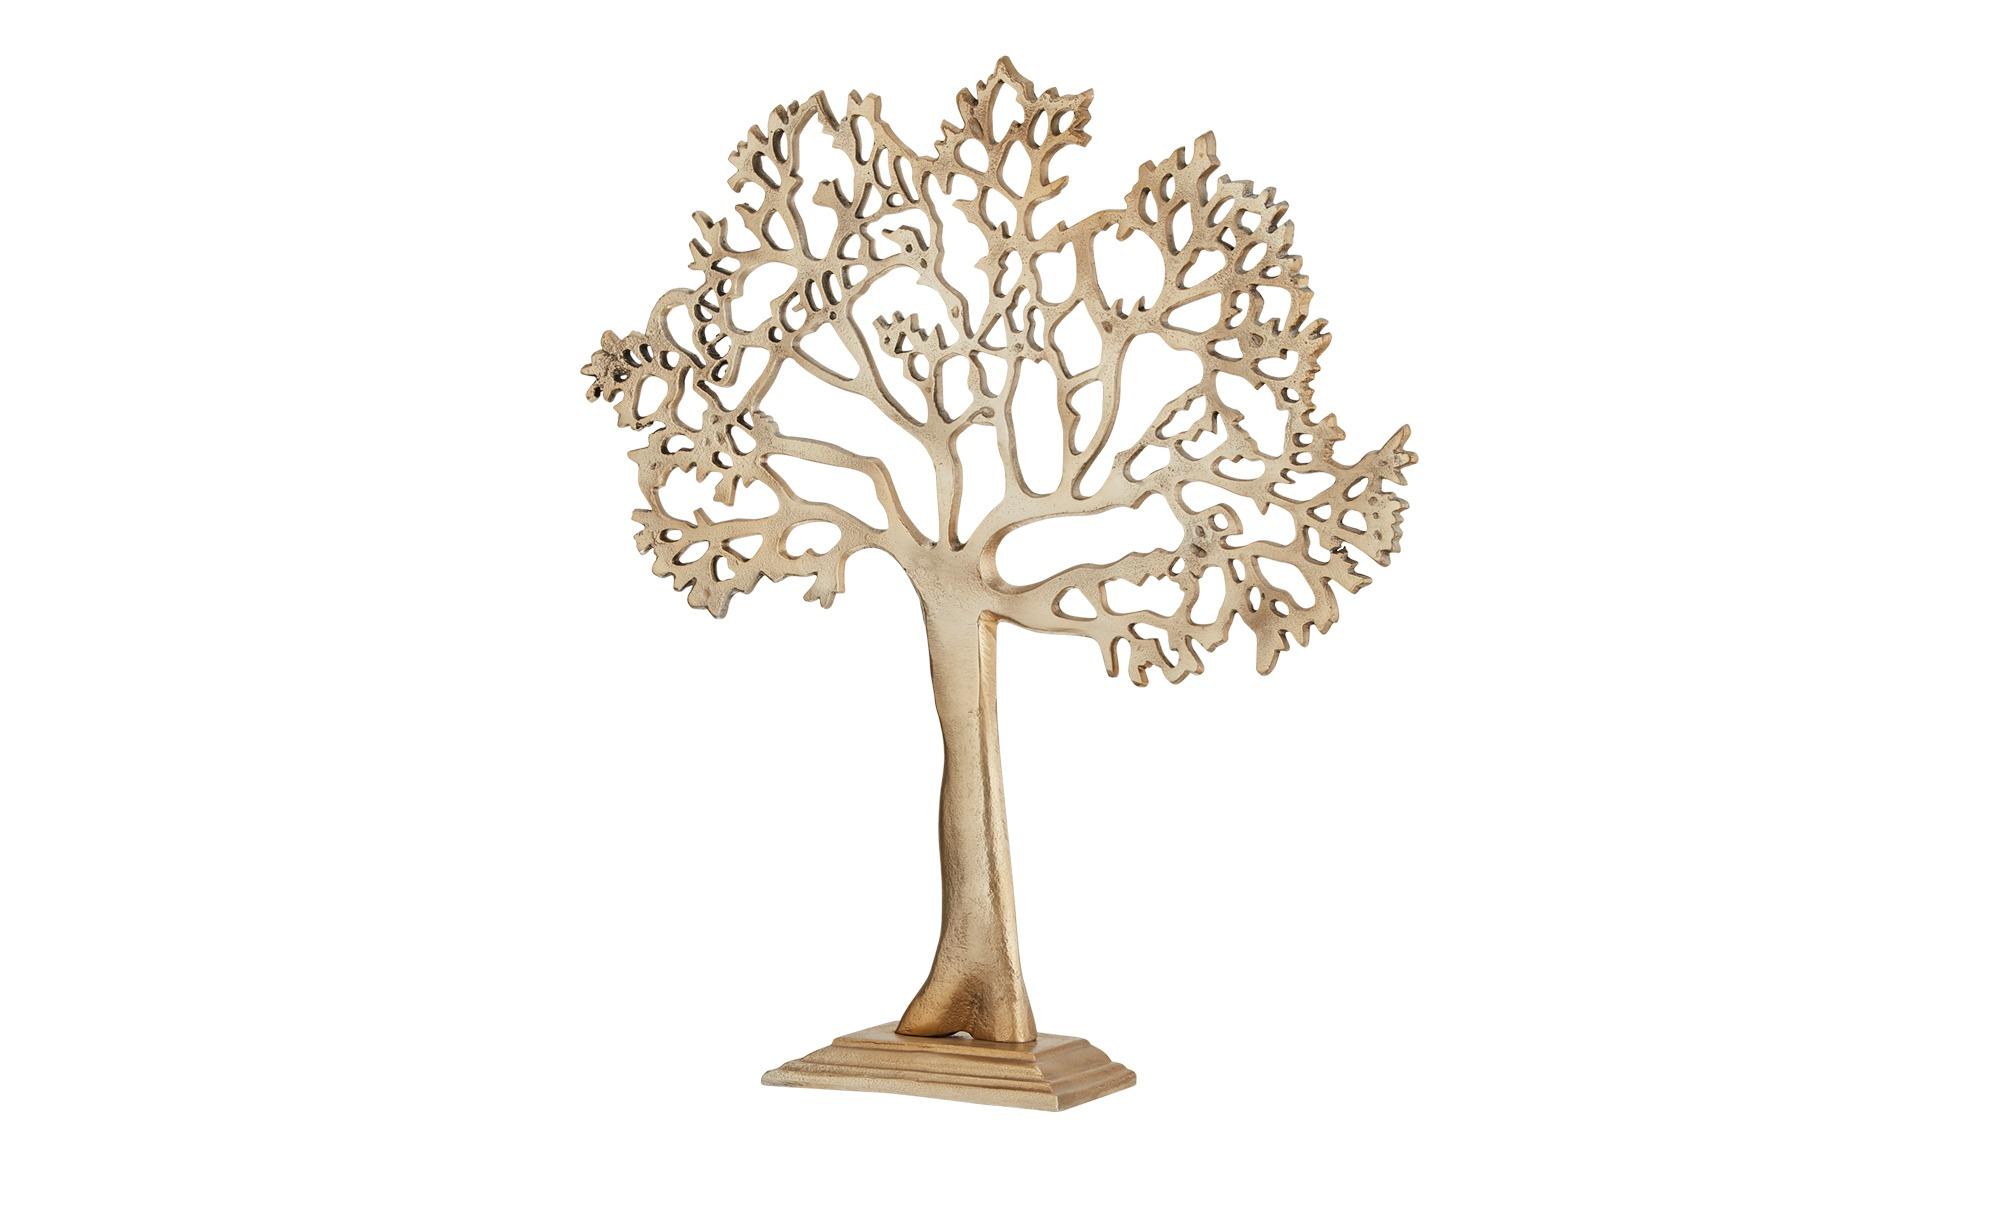 Deko Objekt   Baum ¦ gold ¦ Aluminum ¦ Maße (cm): B: 39 H: 42 T: 8,2 Dekoration > Dekoartikel - Höffner | Dekoration > Wandtattoos | Gold | Aluminum | Möbel Höffner DE